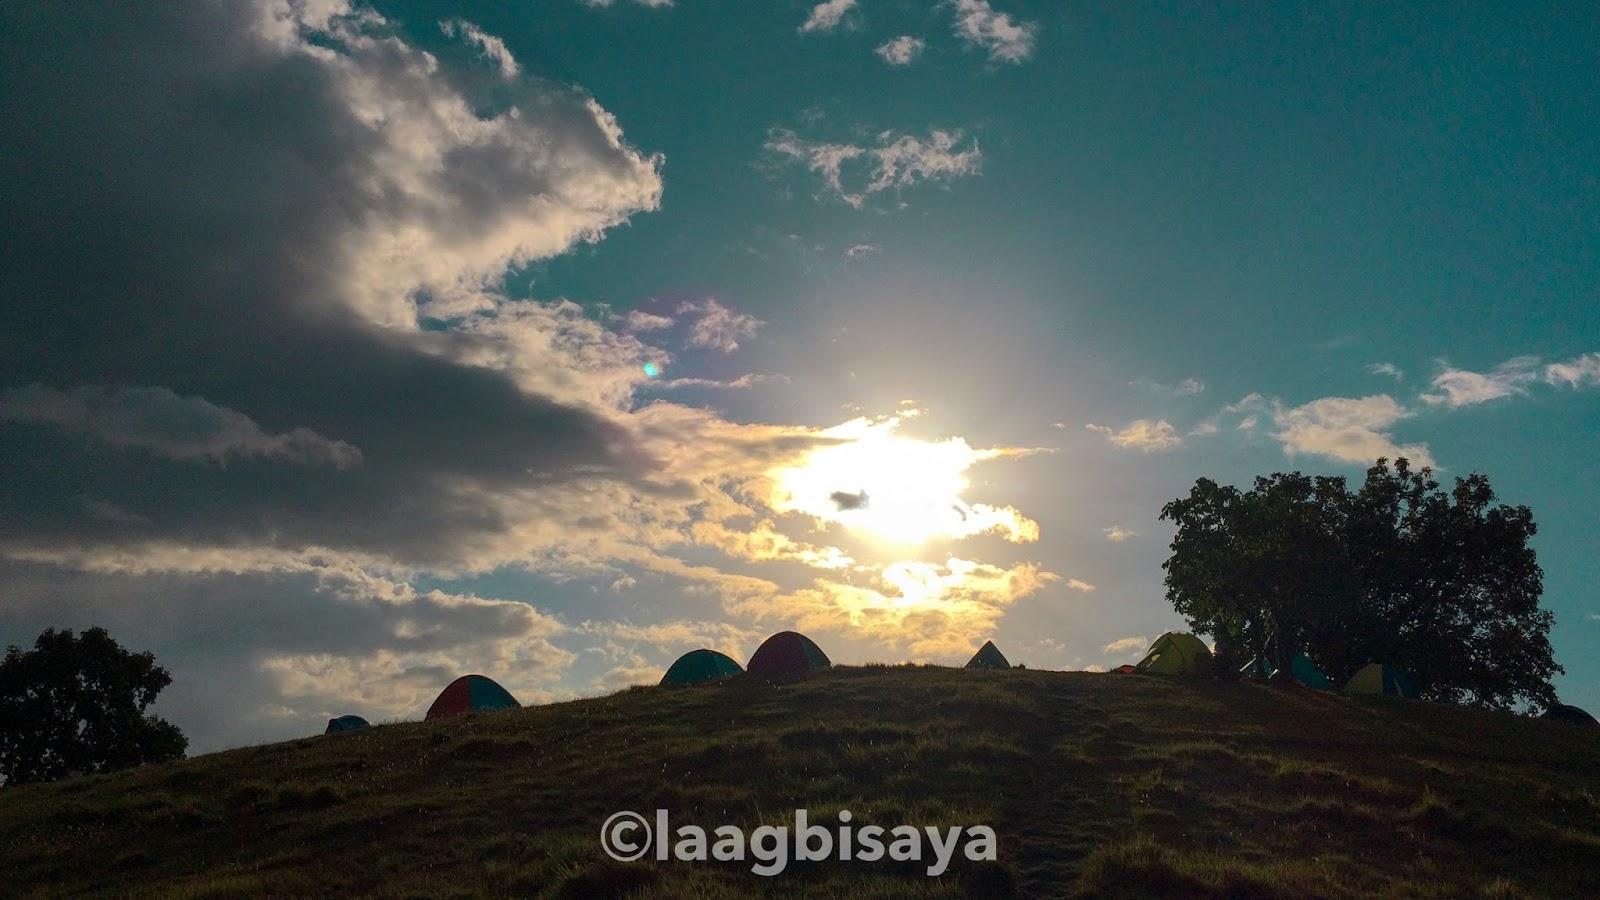 Laag Bisaya